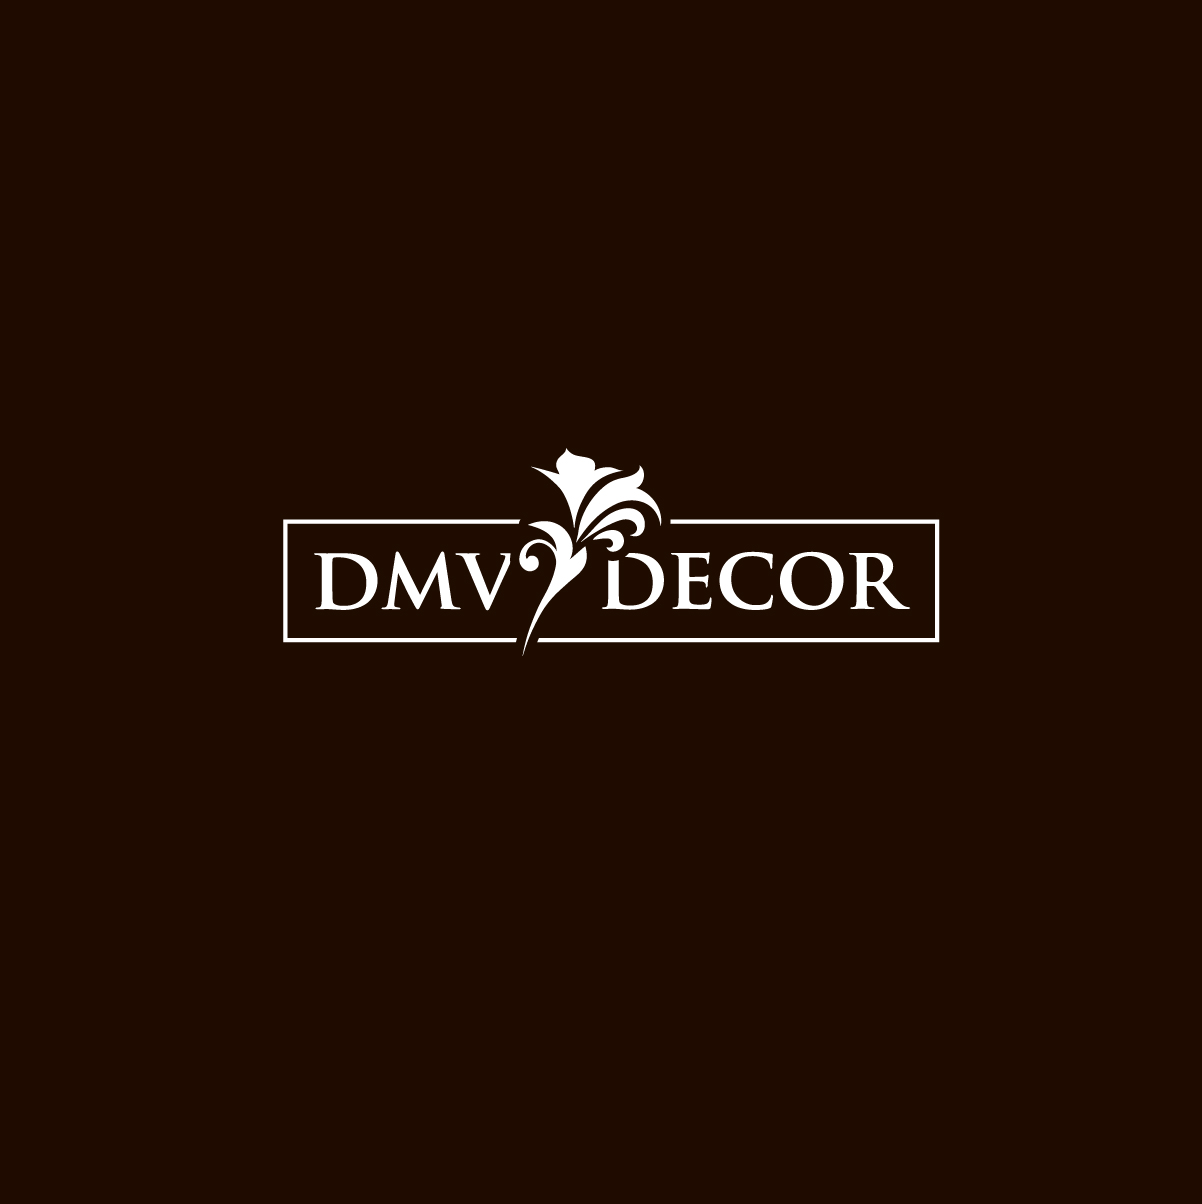 Logo Design by Jodi Kristine Topacio - Entry No. 211 in the Logo Design Contest dmvdecor Logo Design.